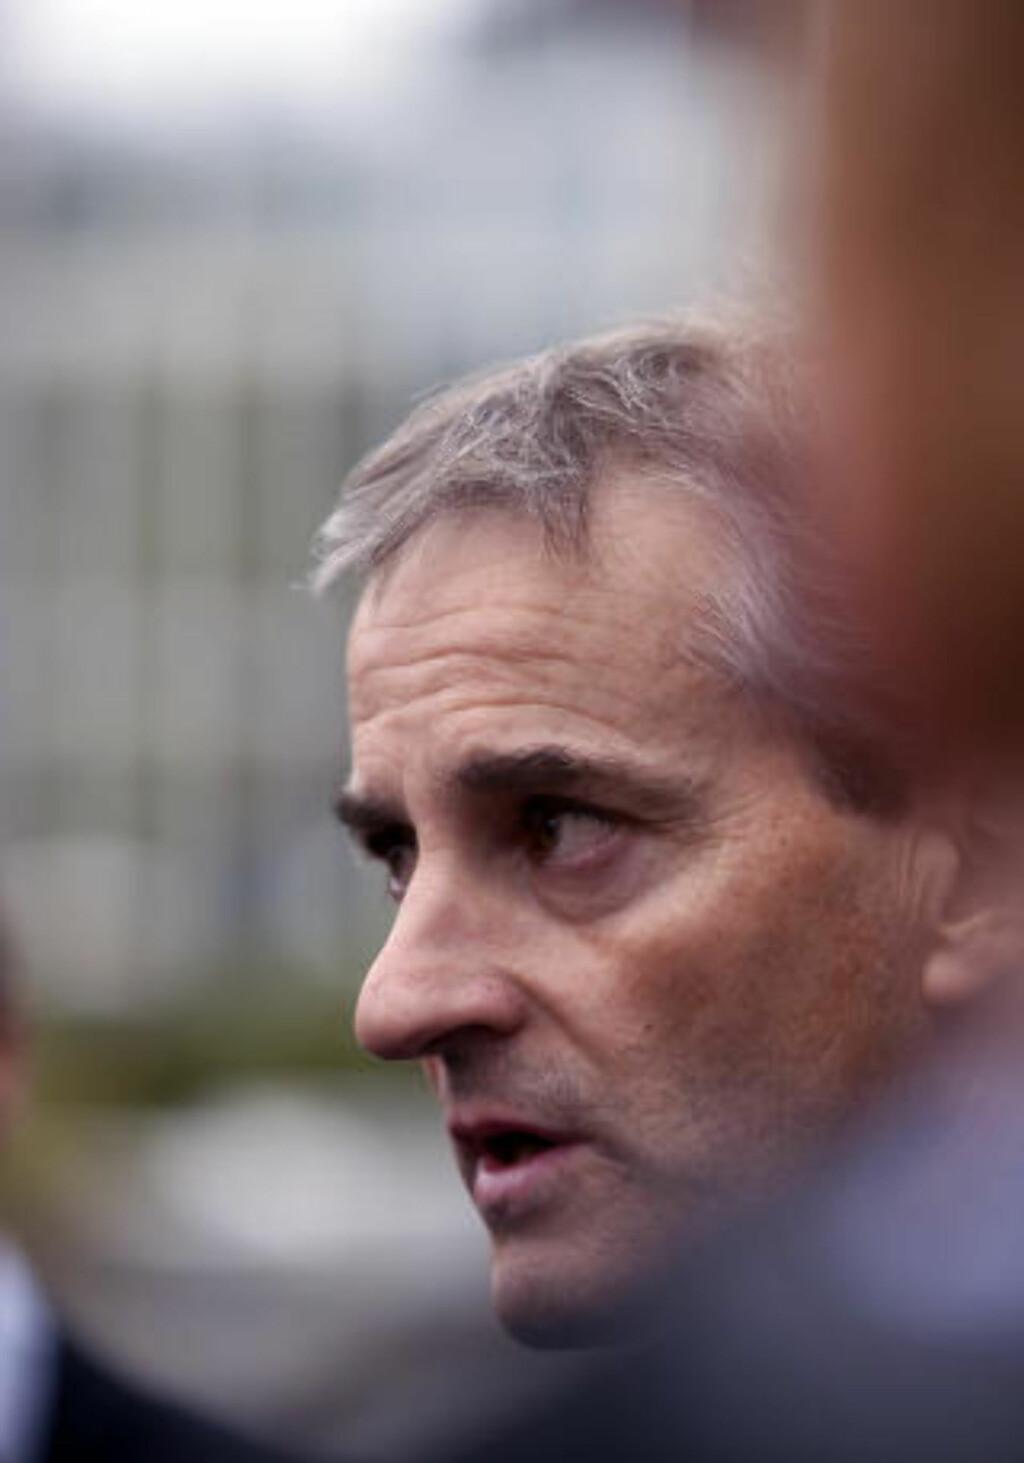 ORIENTERT: Utenriksminister Jonas Gahr Støre. Foto: Sara Johannessen / Scanpix